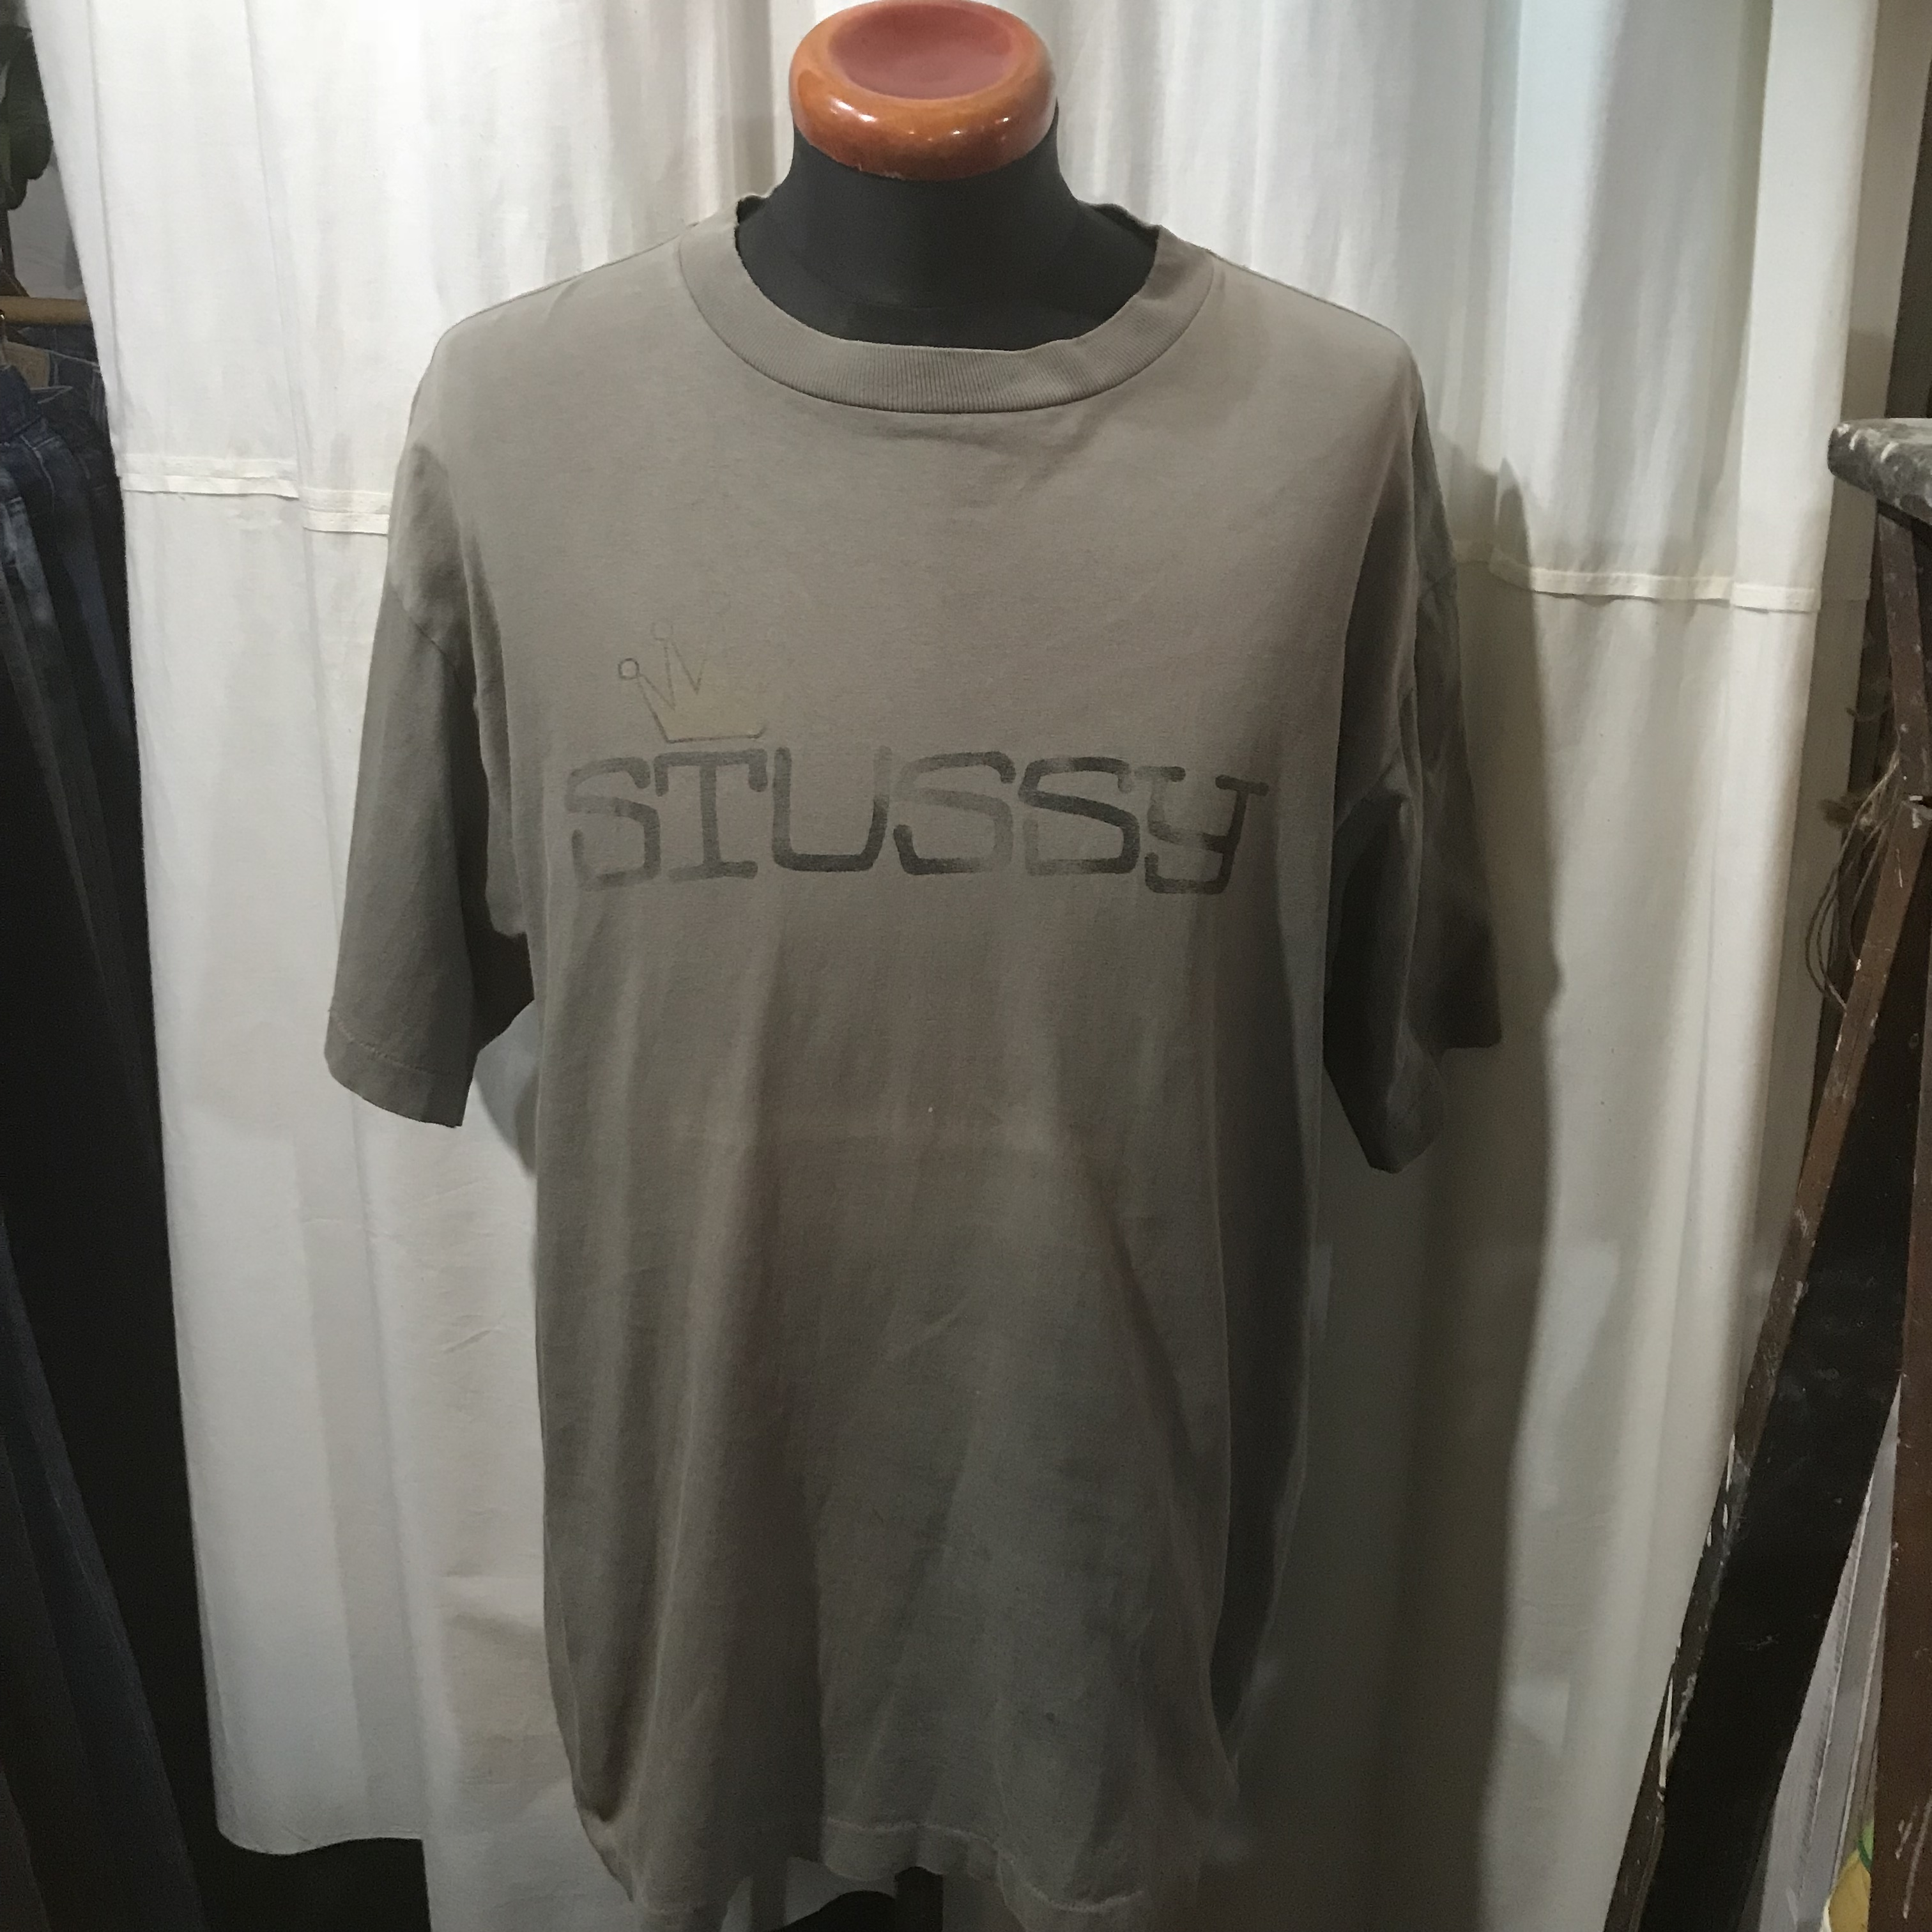 80's vintage アメリカ製 STUSSY 半袖Tシャツ 黒タグ 100%コットン メンズL~XL